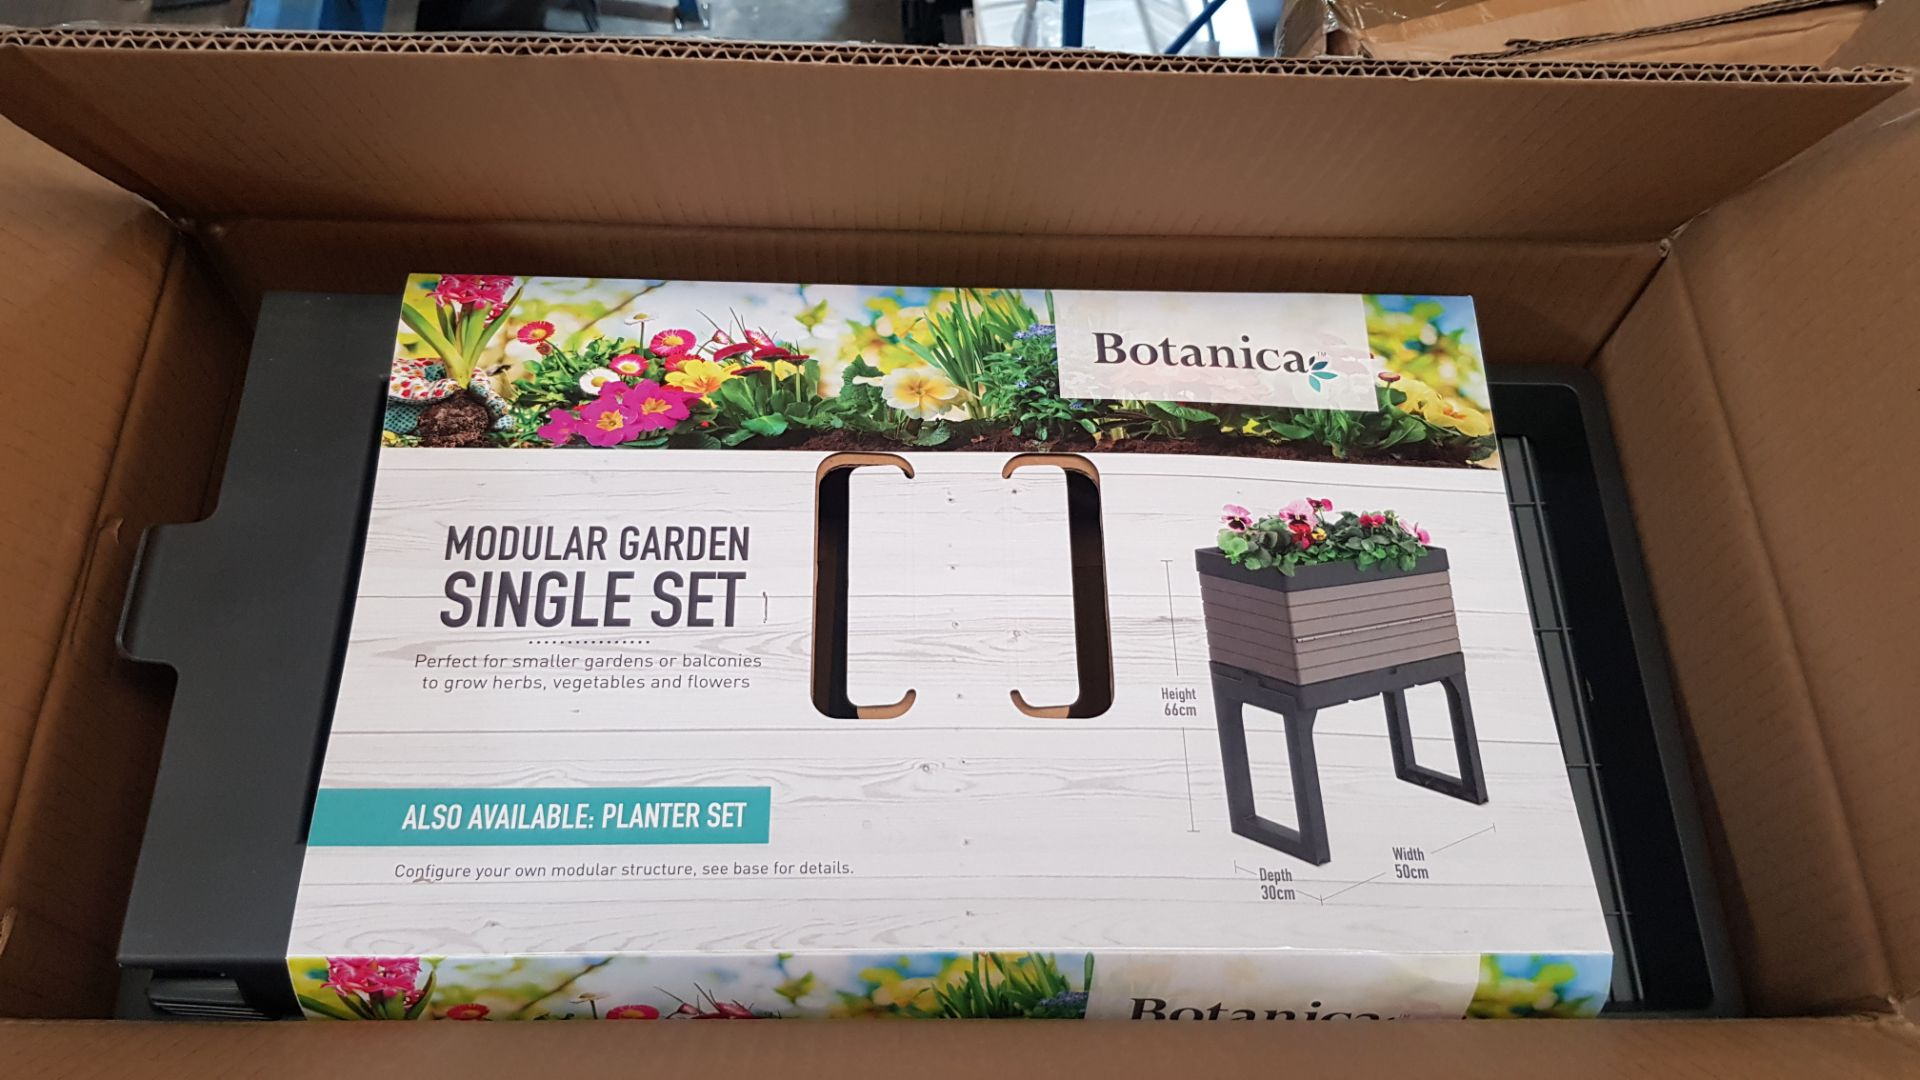 (P6) 2x Botanica Modular Garden Single Set Grey RRP £50 Each. New, Sealed Item. - Image 3 of 5